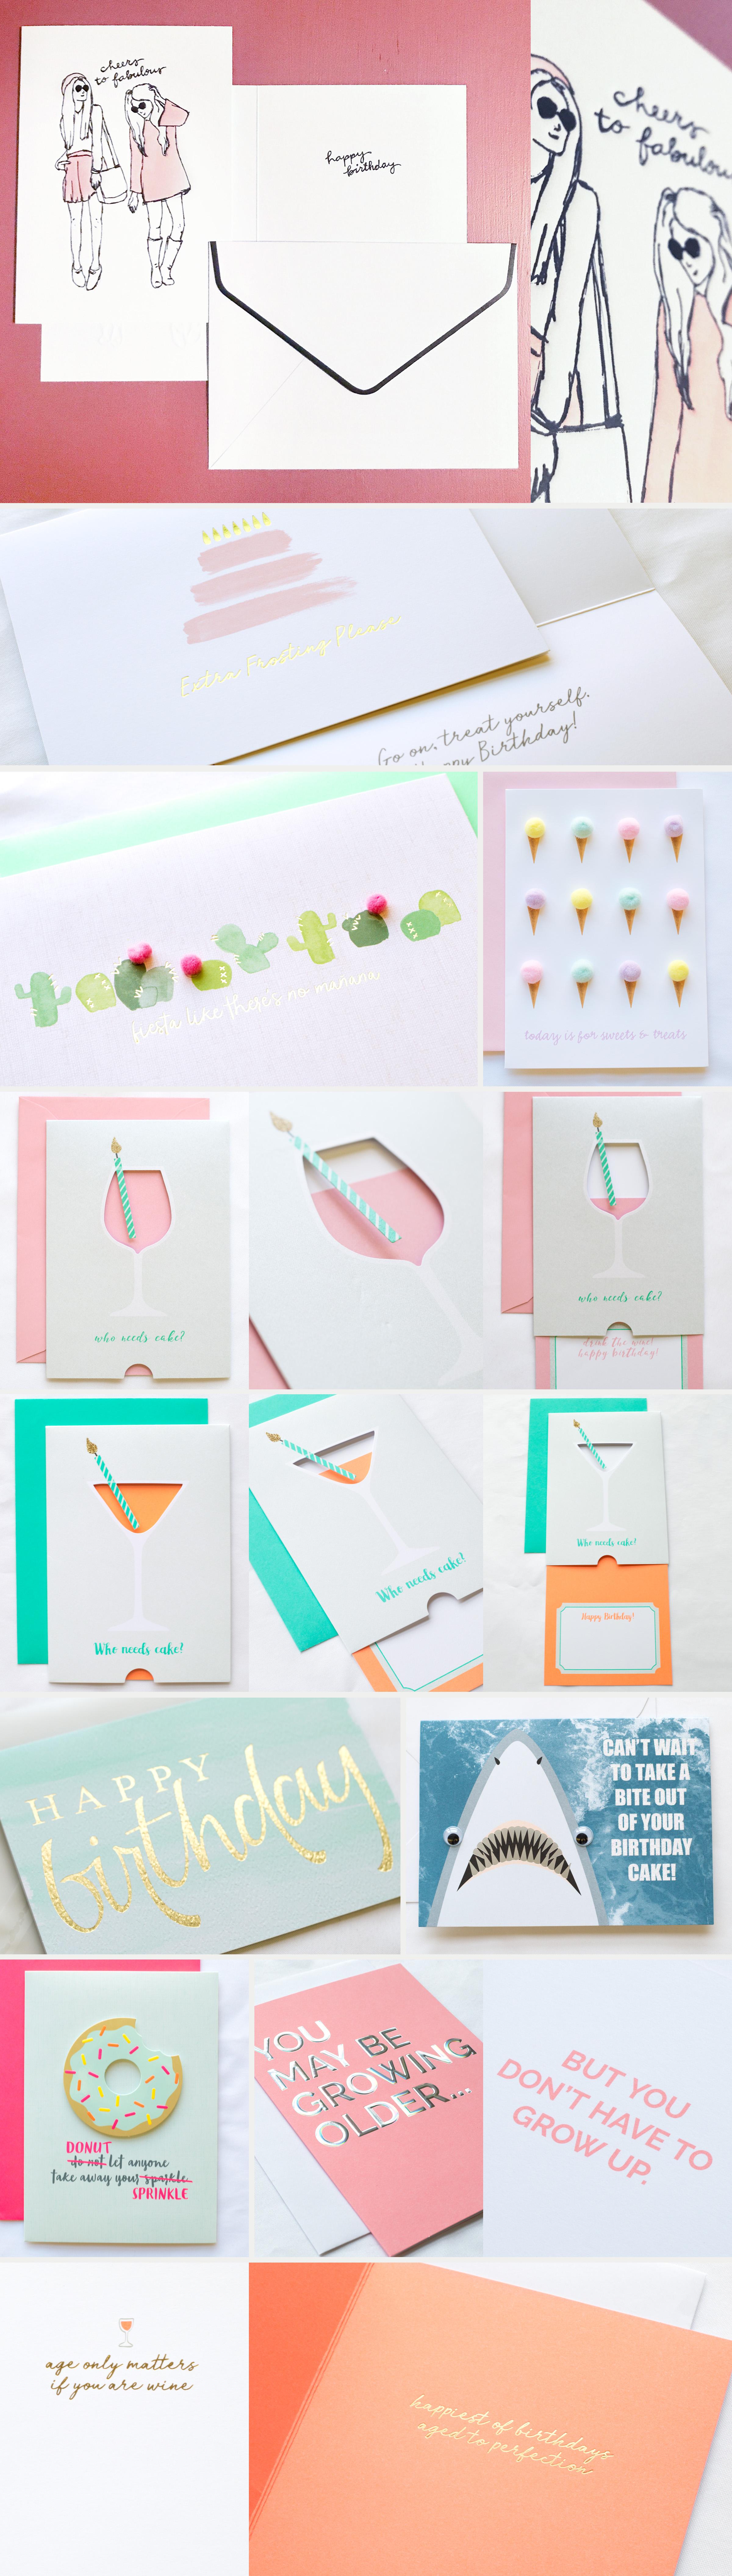 Gartner_Greeting_Cards-birthday.jpg